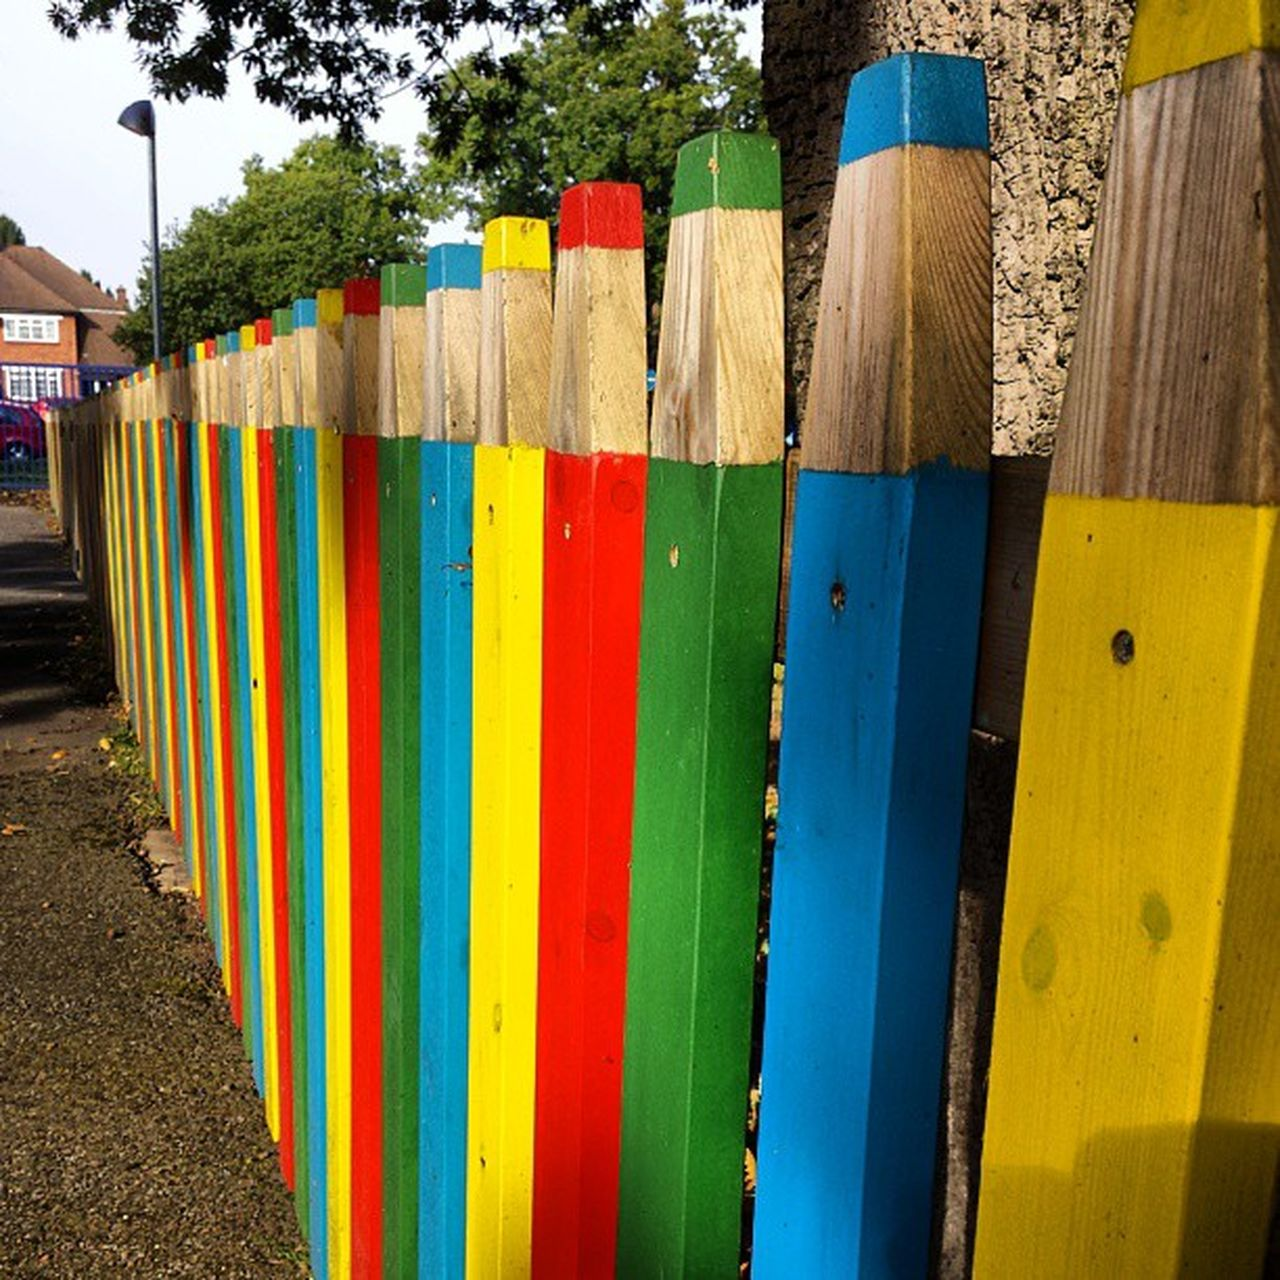 Visions of Croydon Schoolplaygrounds Receptionphotos